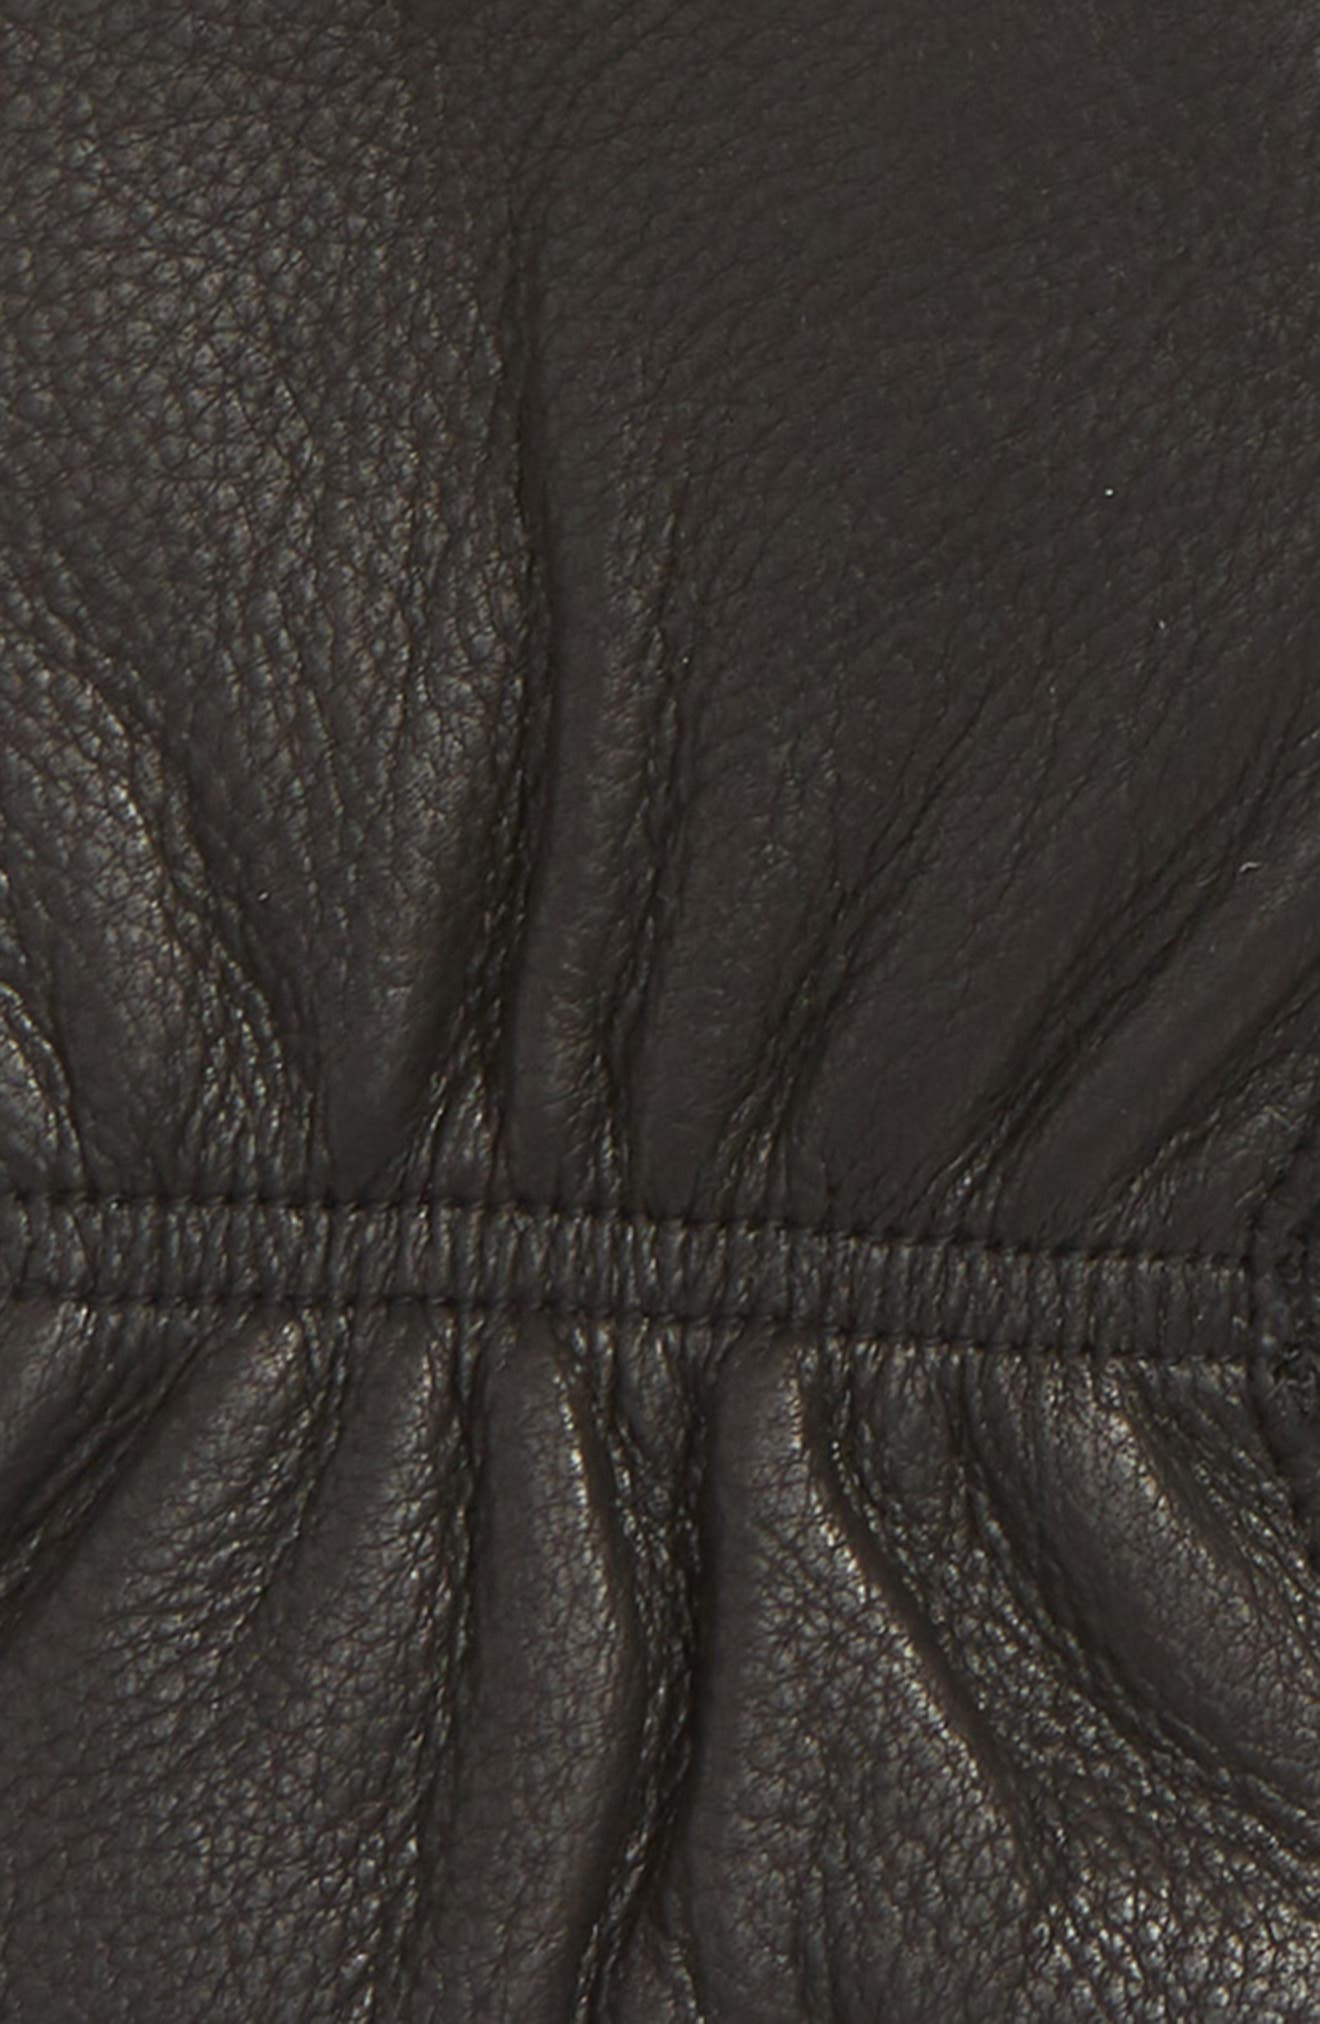 Finger Lined Deerskin Mittens,                             Alternate thumbnail 2, color,                             BLACK